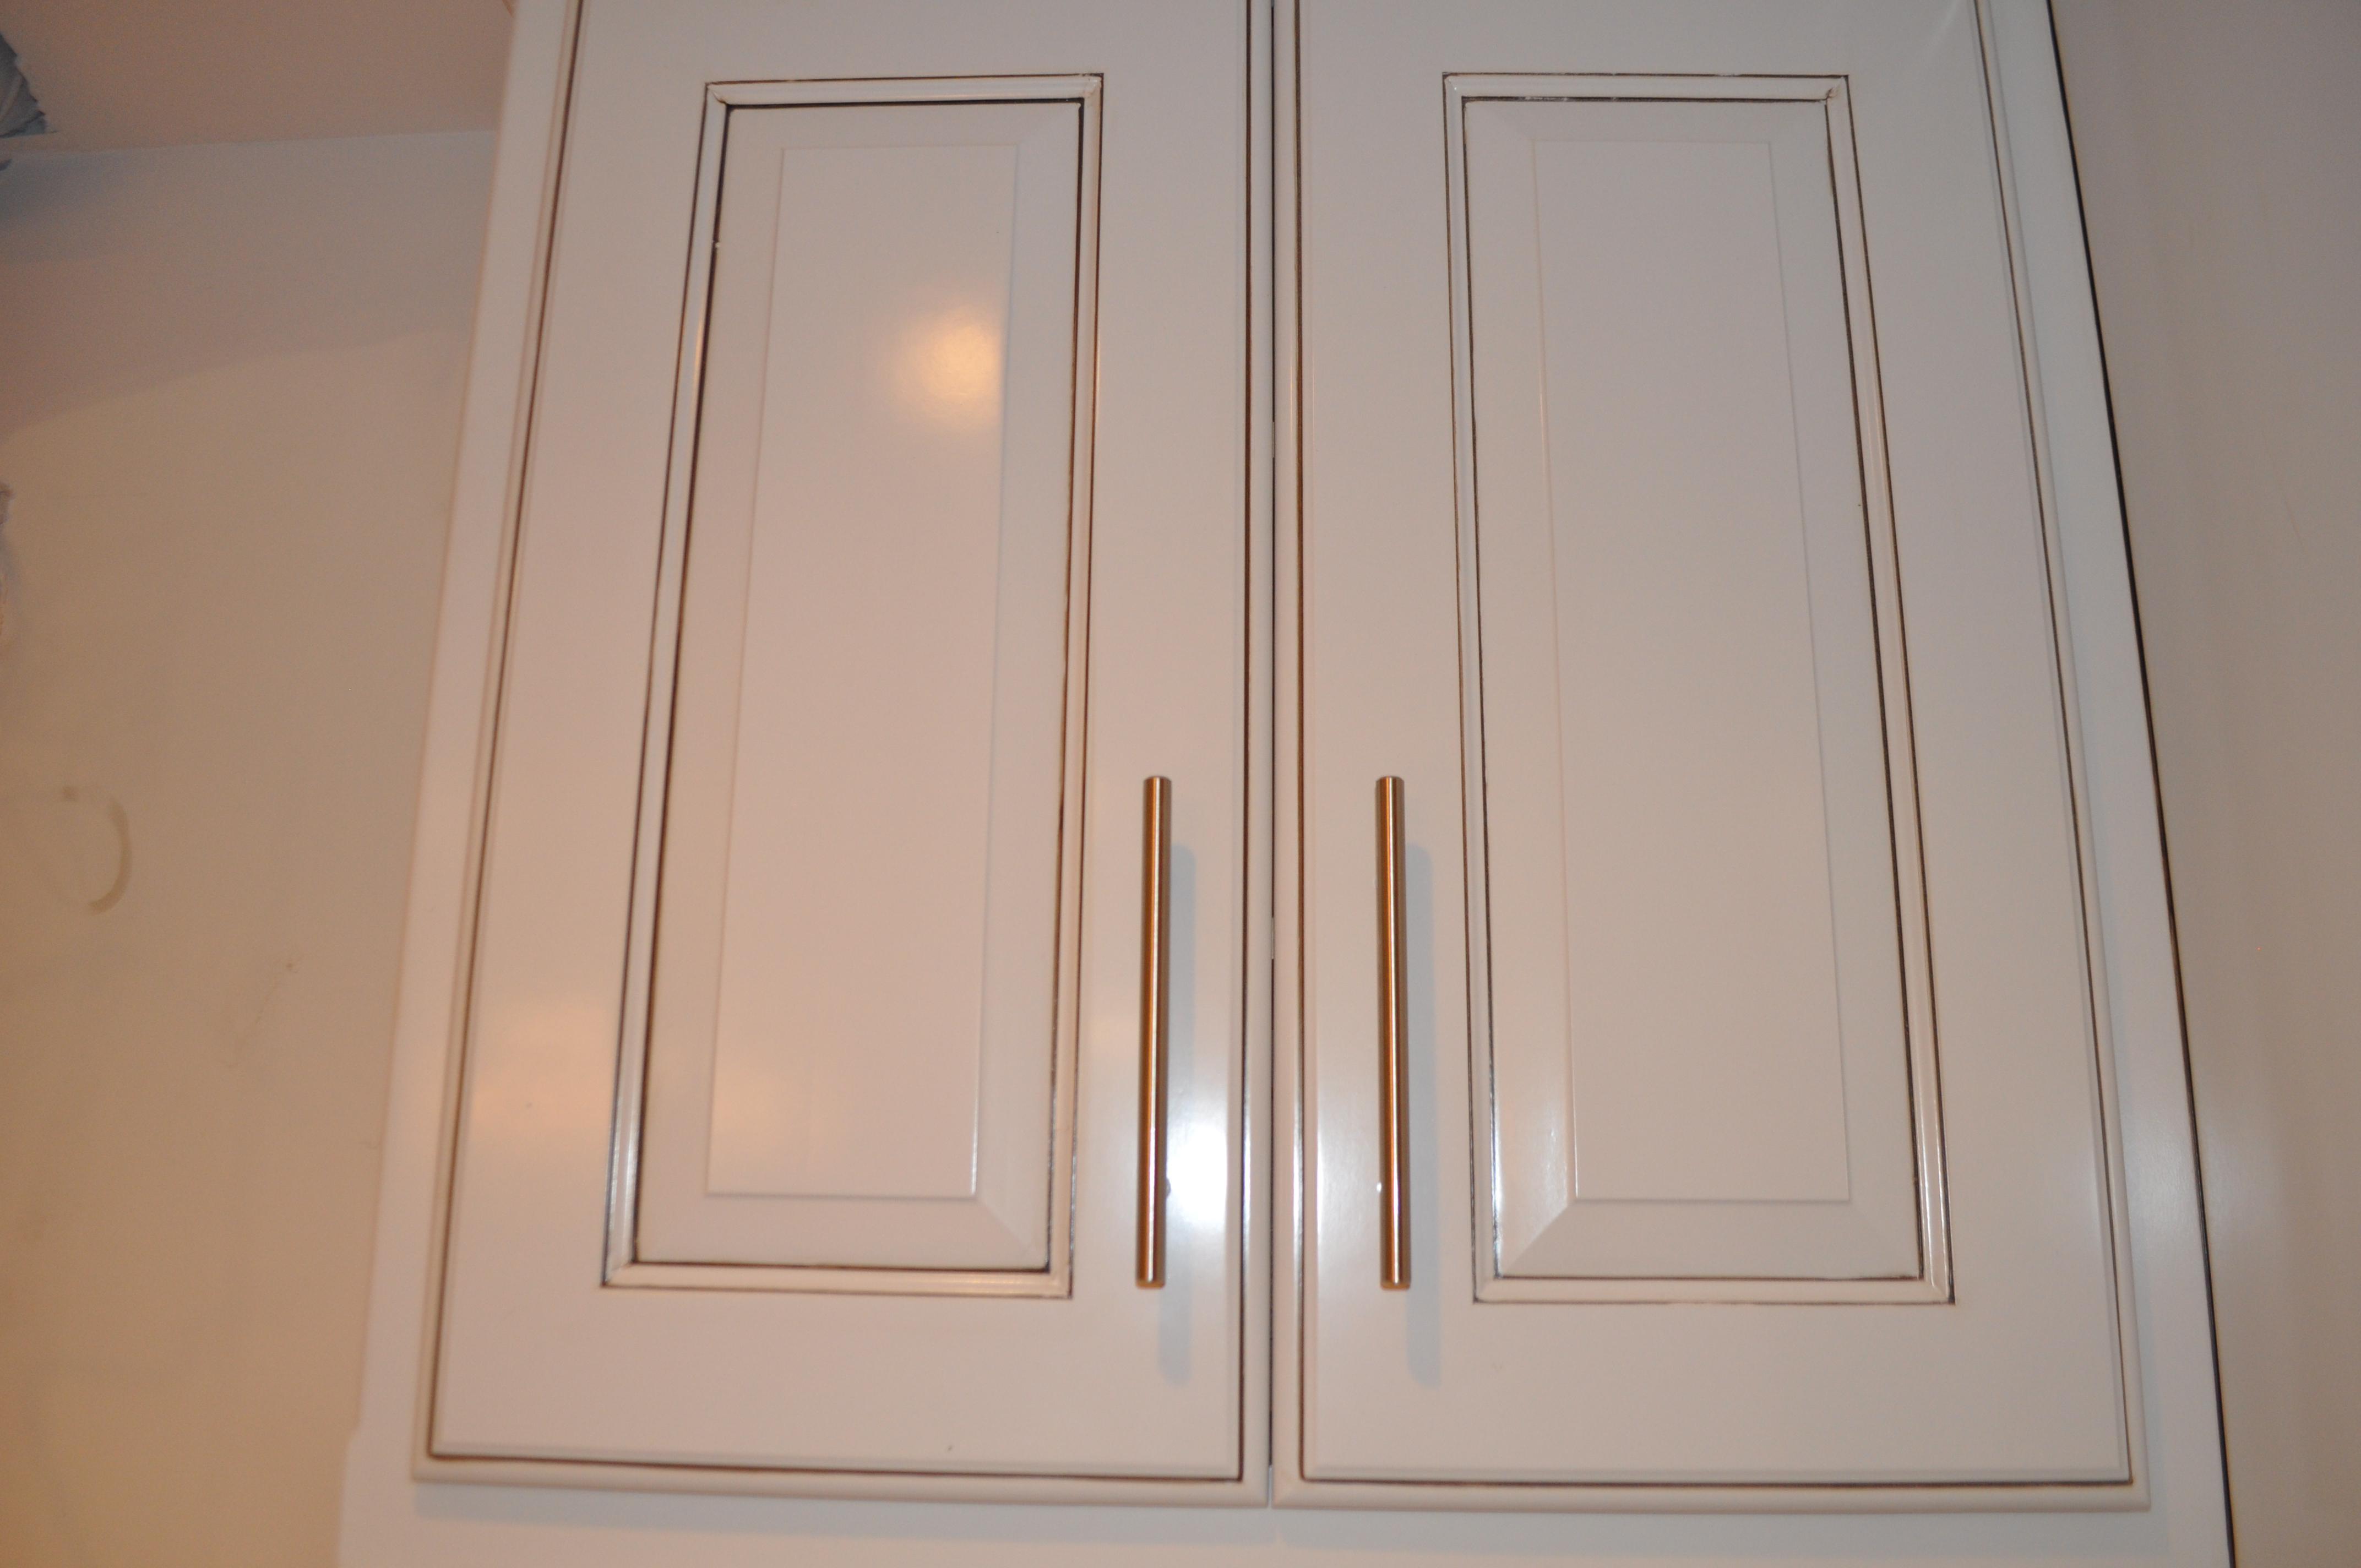 kitchen cabinets door knobs kitchen cabinets knobs Amazing Kitchen CabiDoor Handles